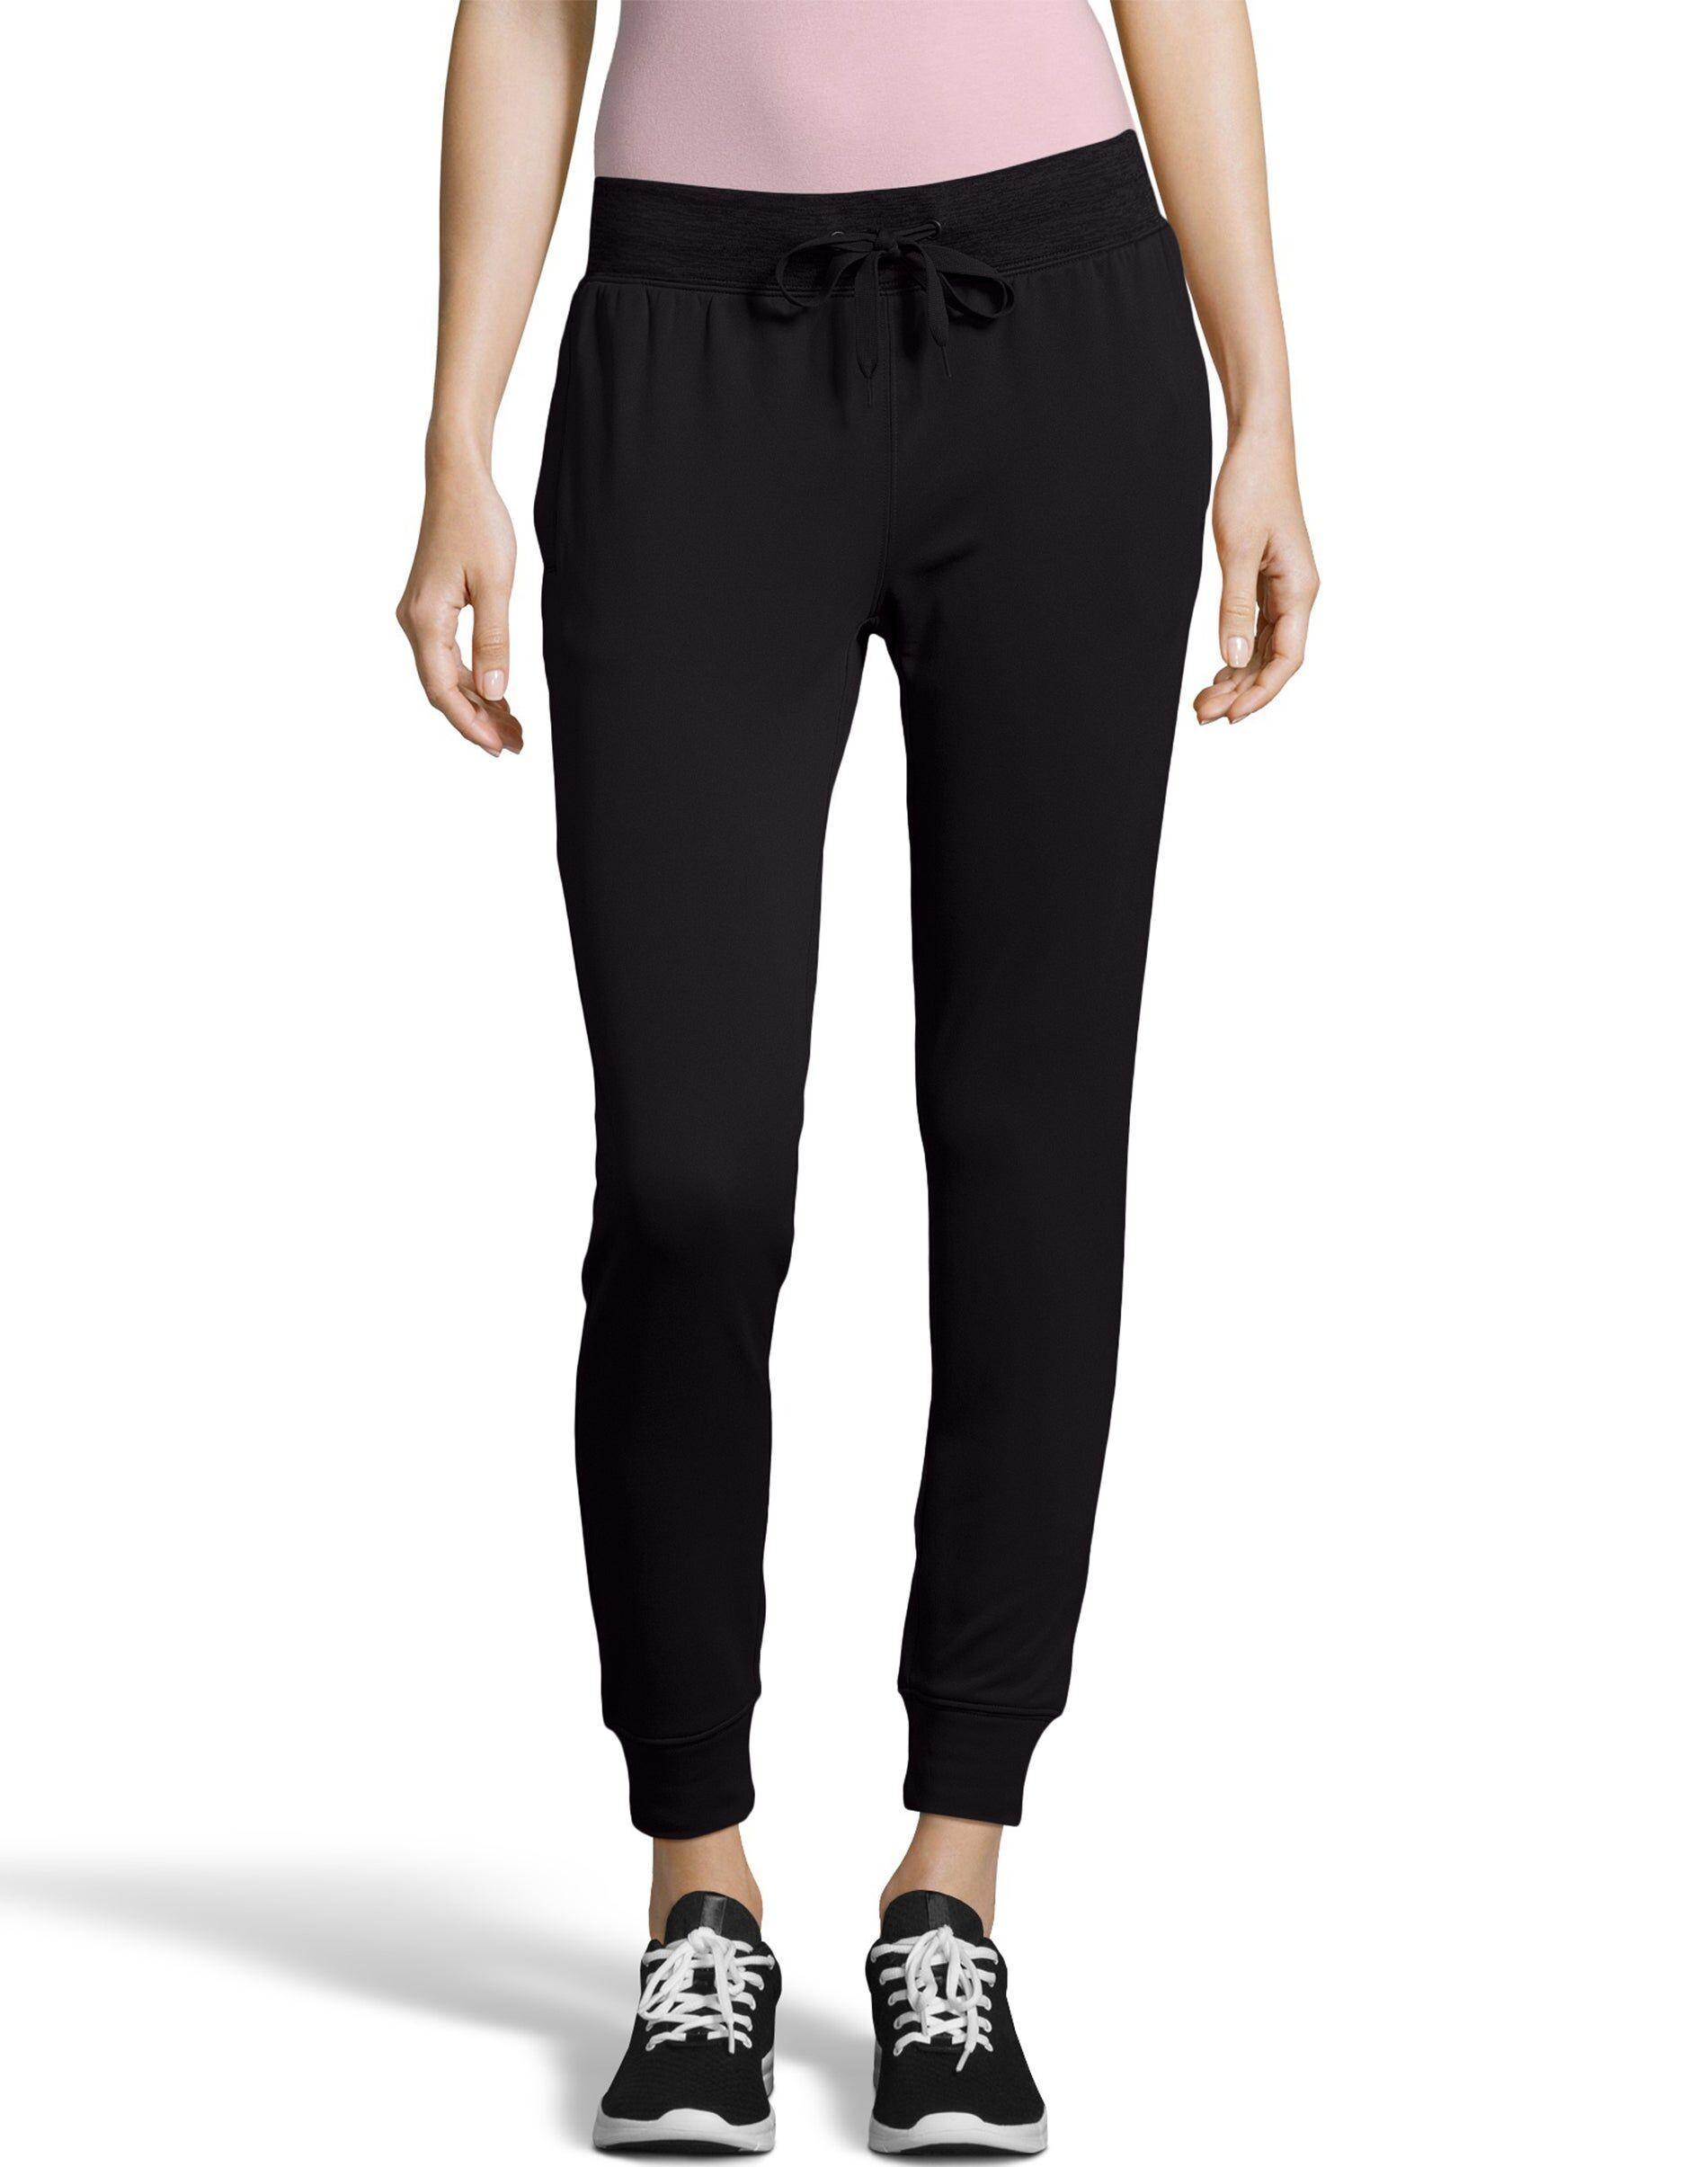 Hanes Sport Women's Performance Fleece Jogger Pants With Pockets Black/Black Heather M